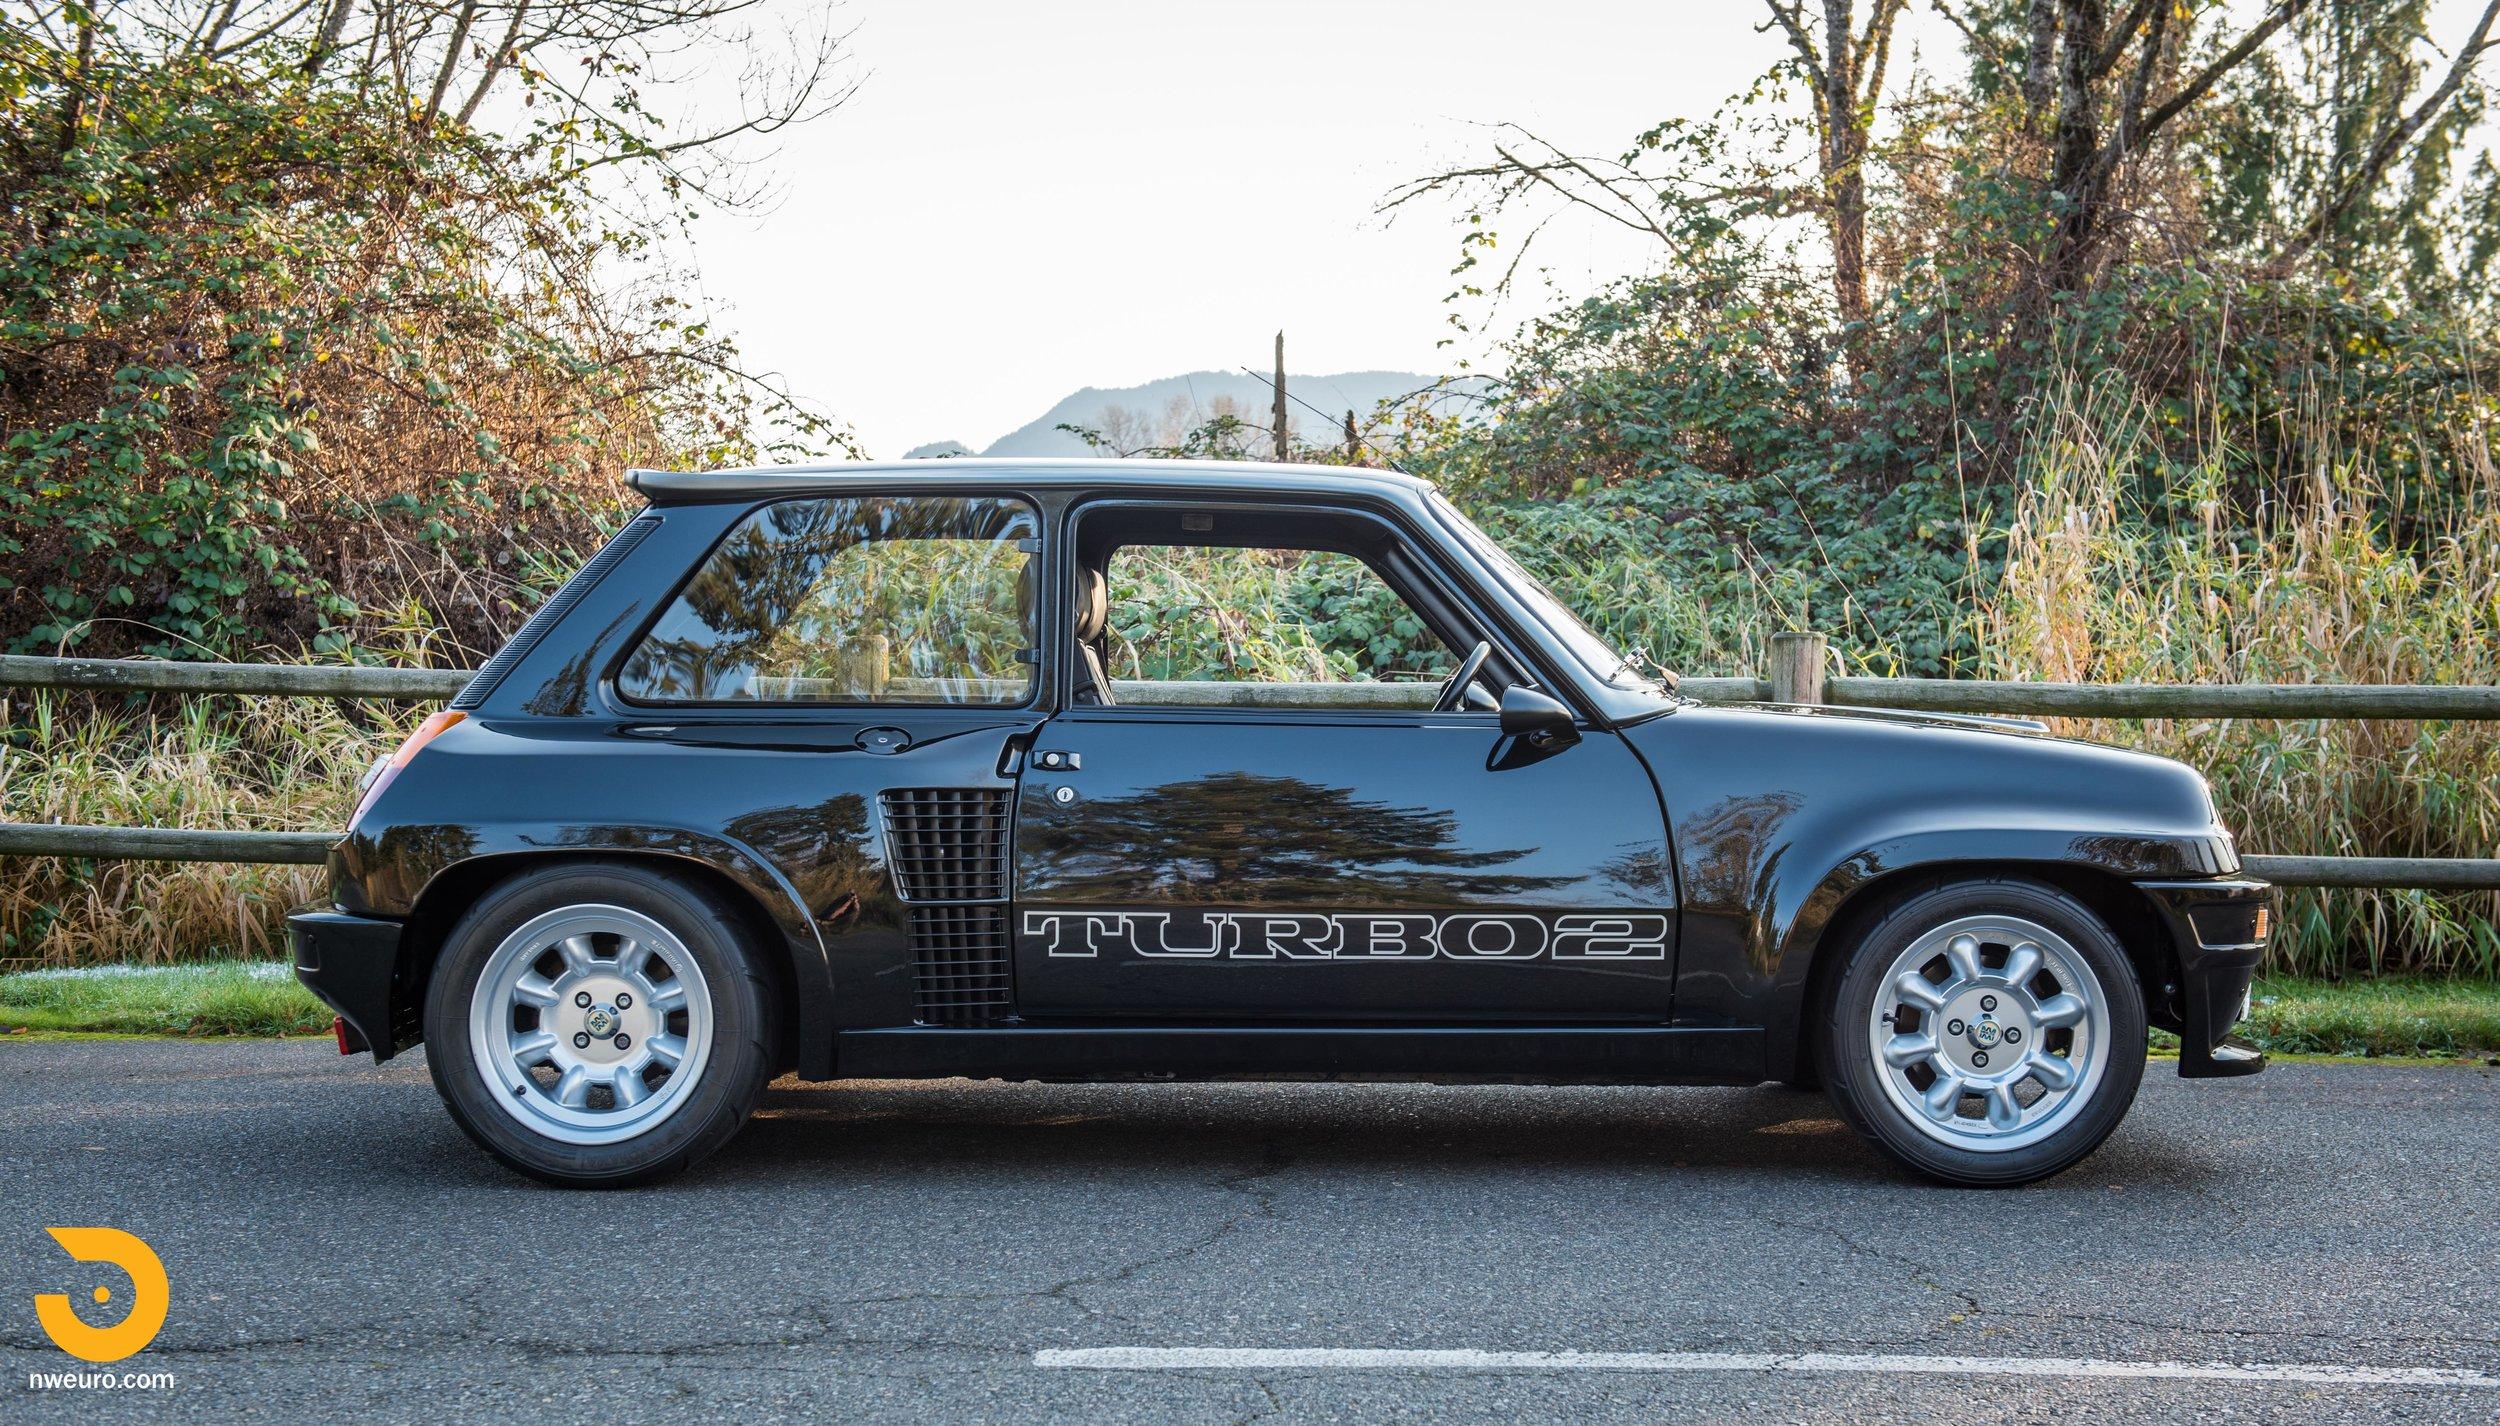 1983 Renault R5 Turbo 2 Black at Park-4.jpg